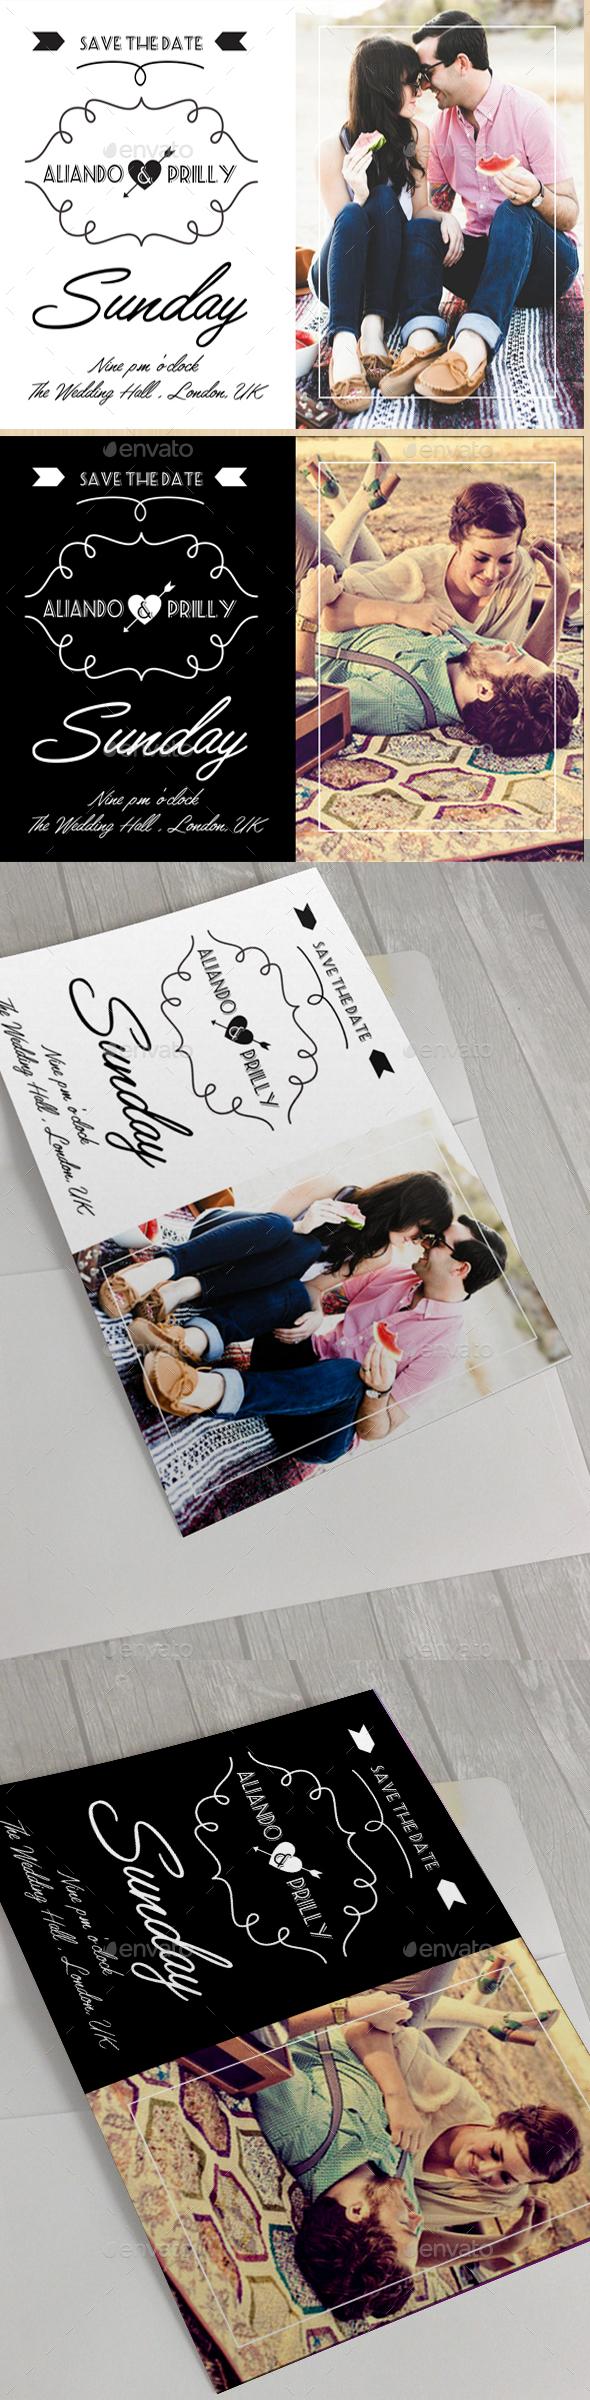 Modern Wedding Card V - Weddings Cards & Invites